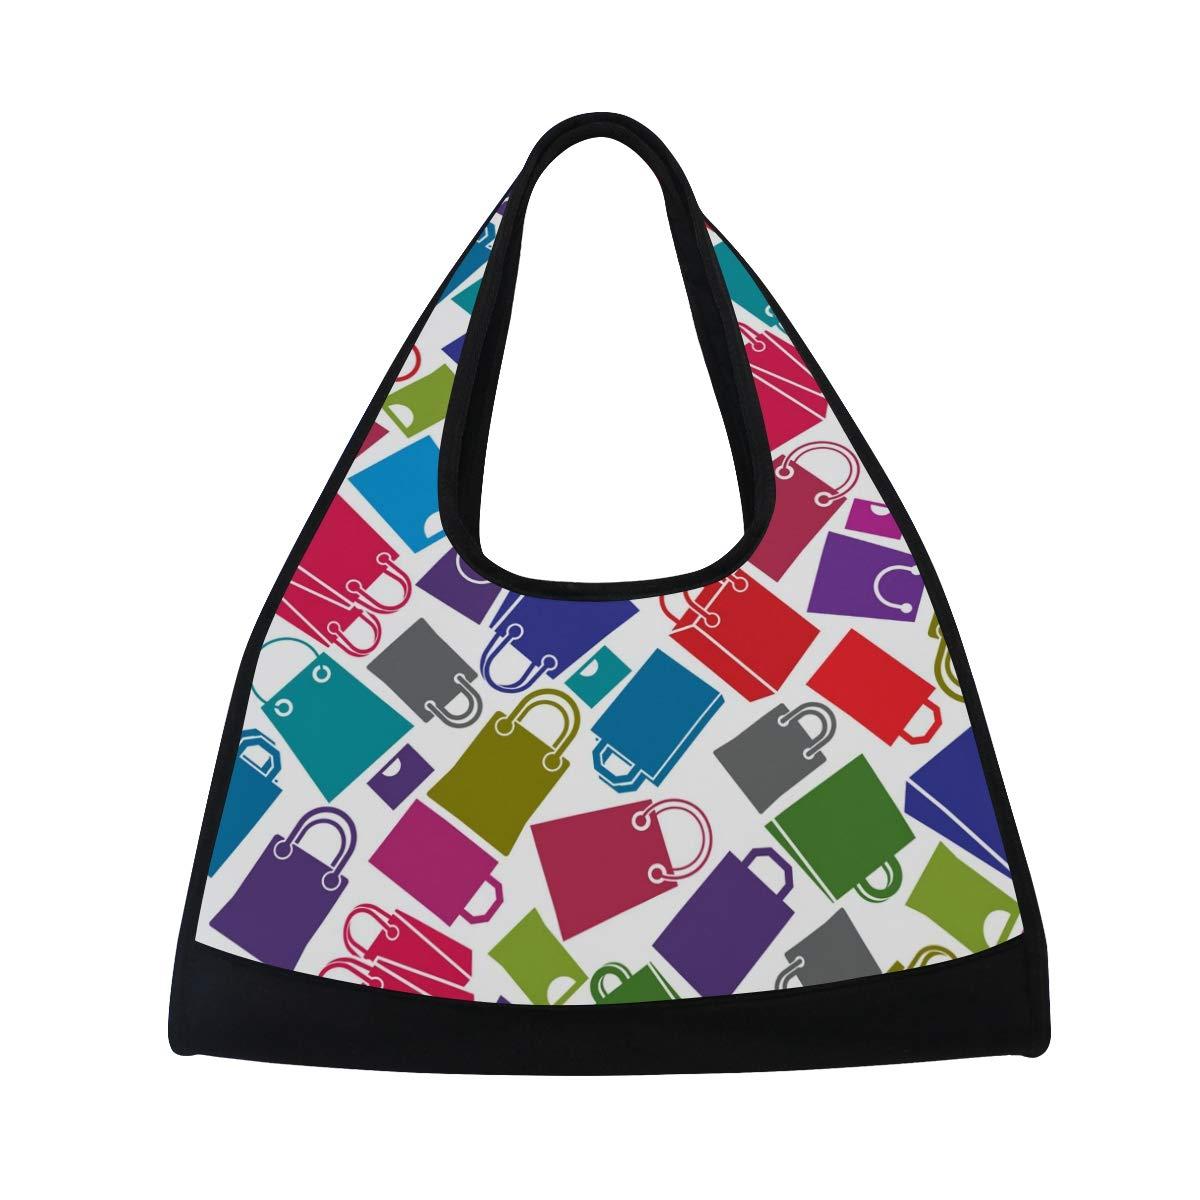 Gym Bag Sports Holdall Shopping Bags Pattern Canvas Shoulder Bag Overnight Travel Bag for Men and Women